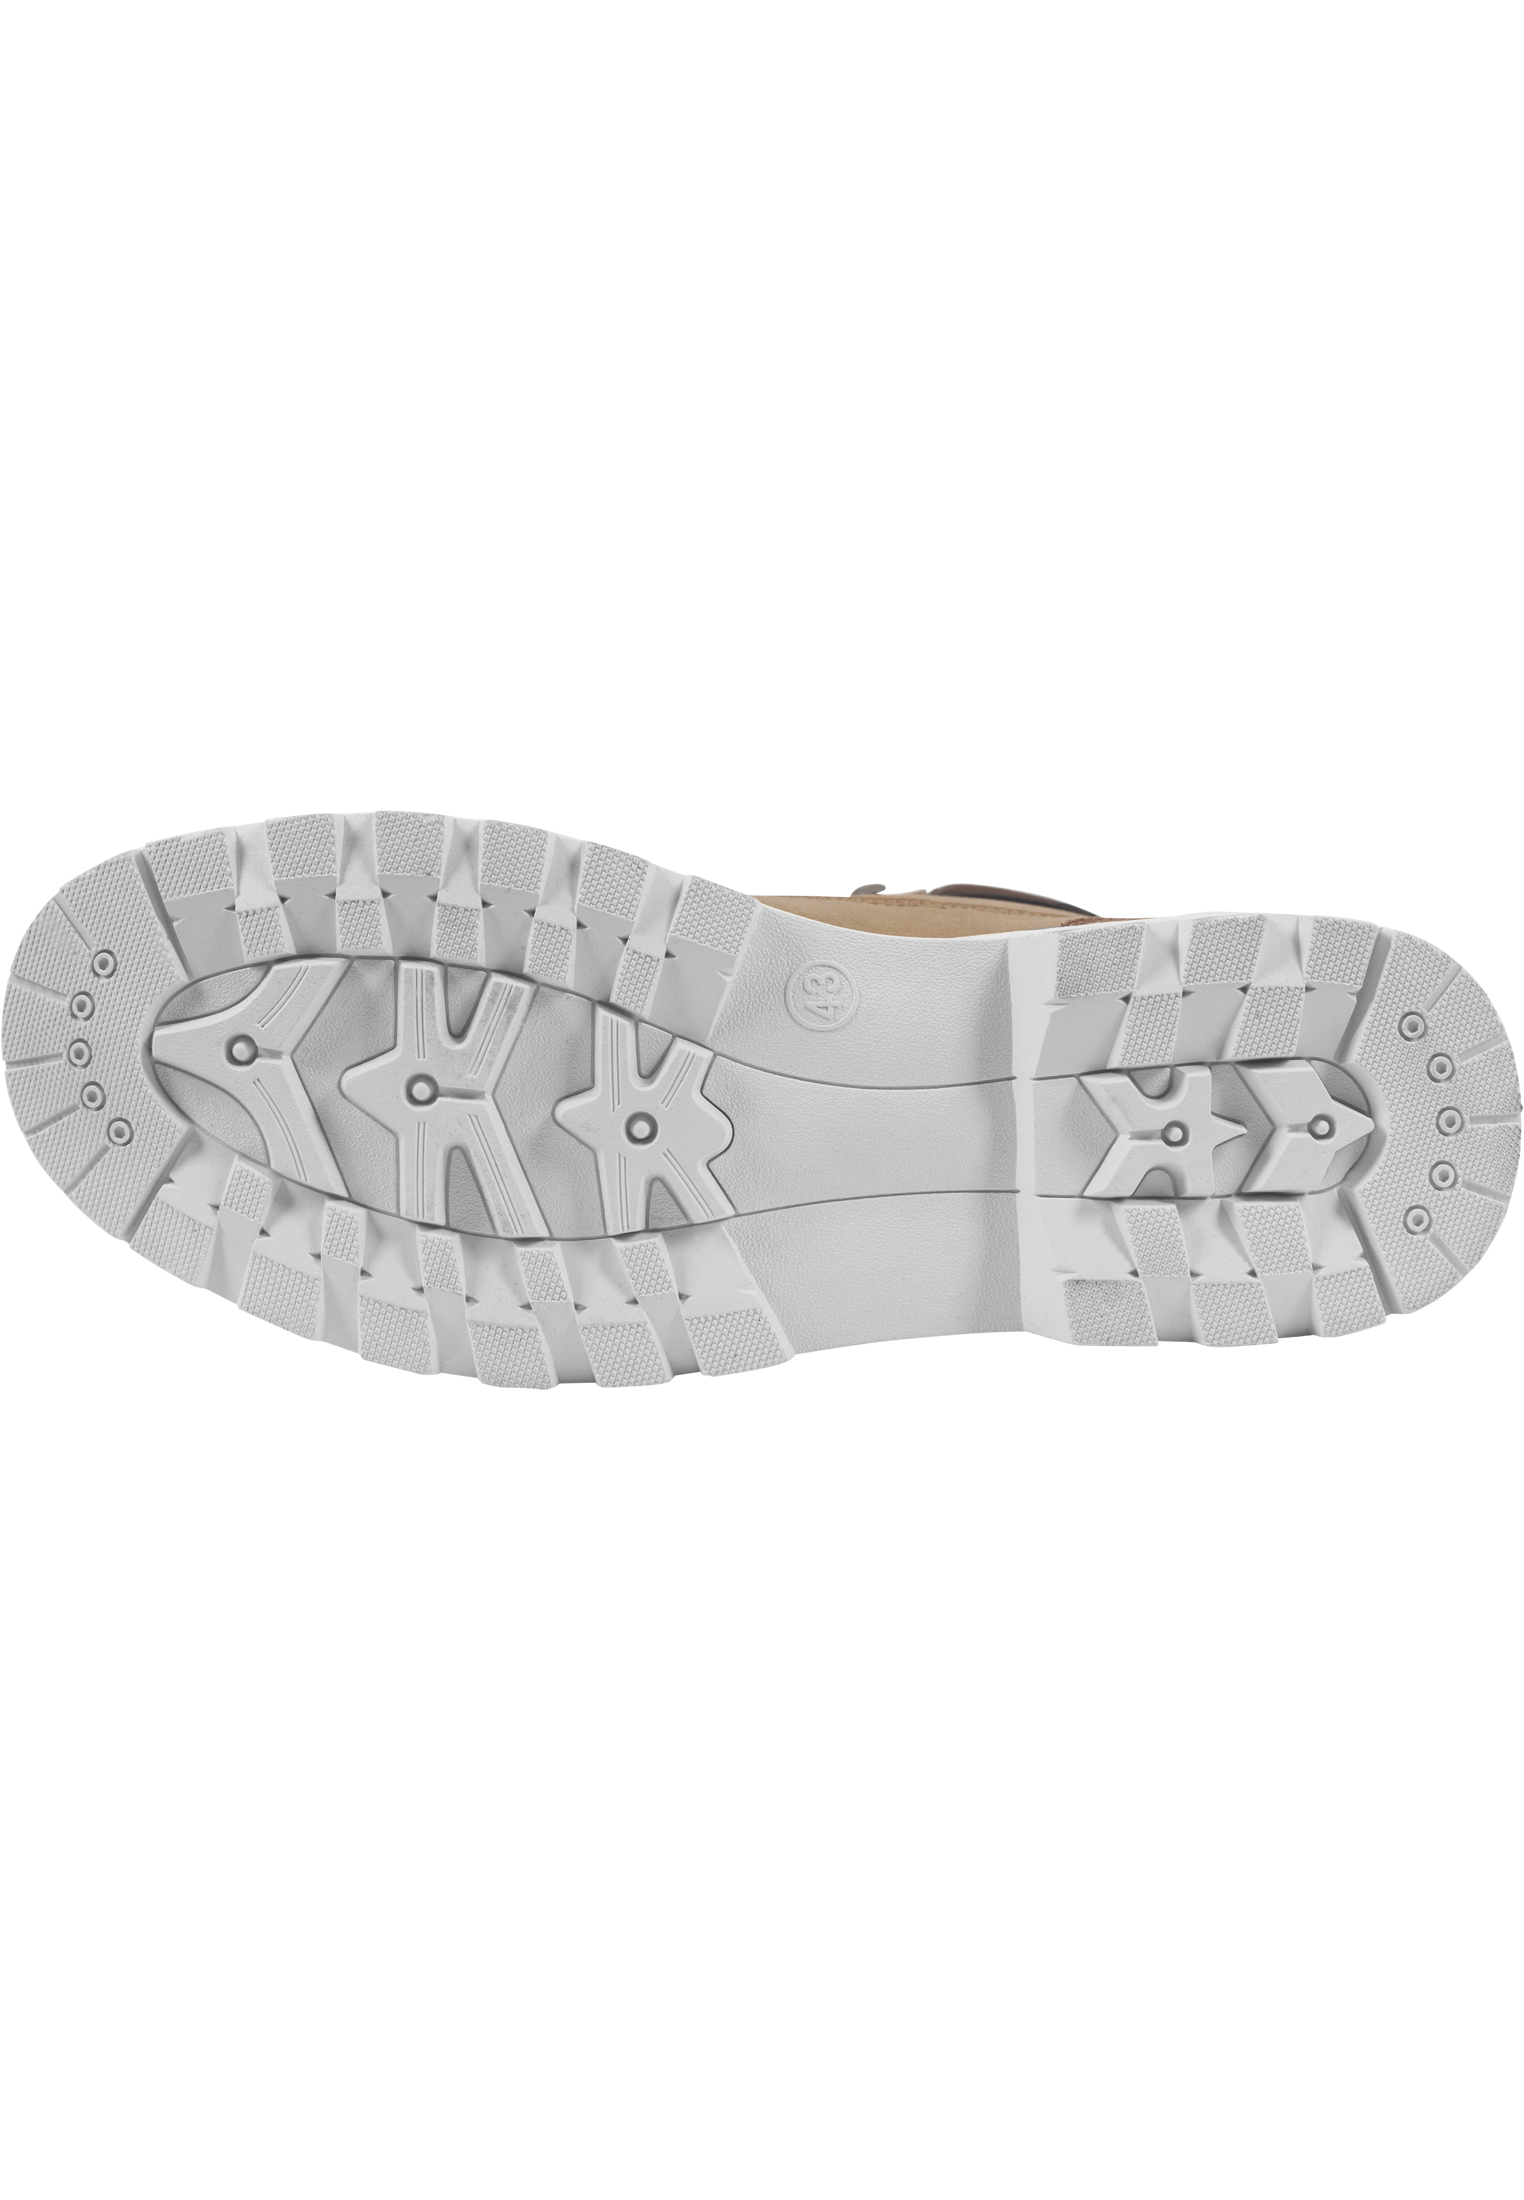 96772a6e2bca Winter Boots-TB1293